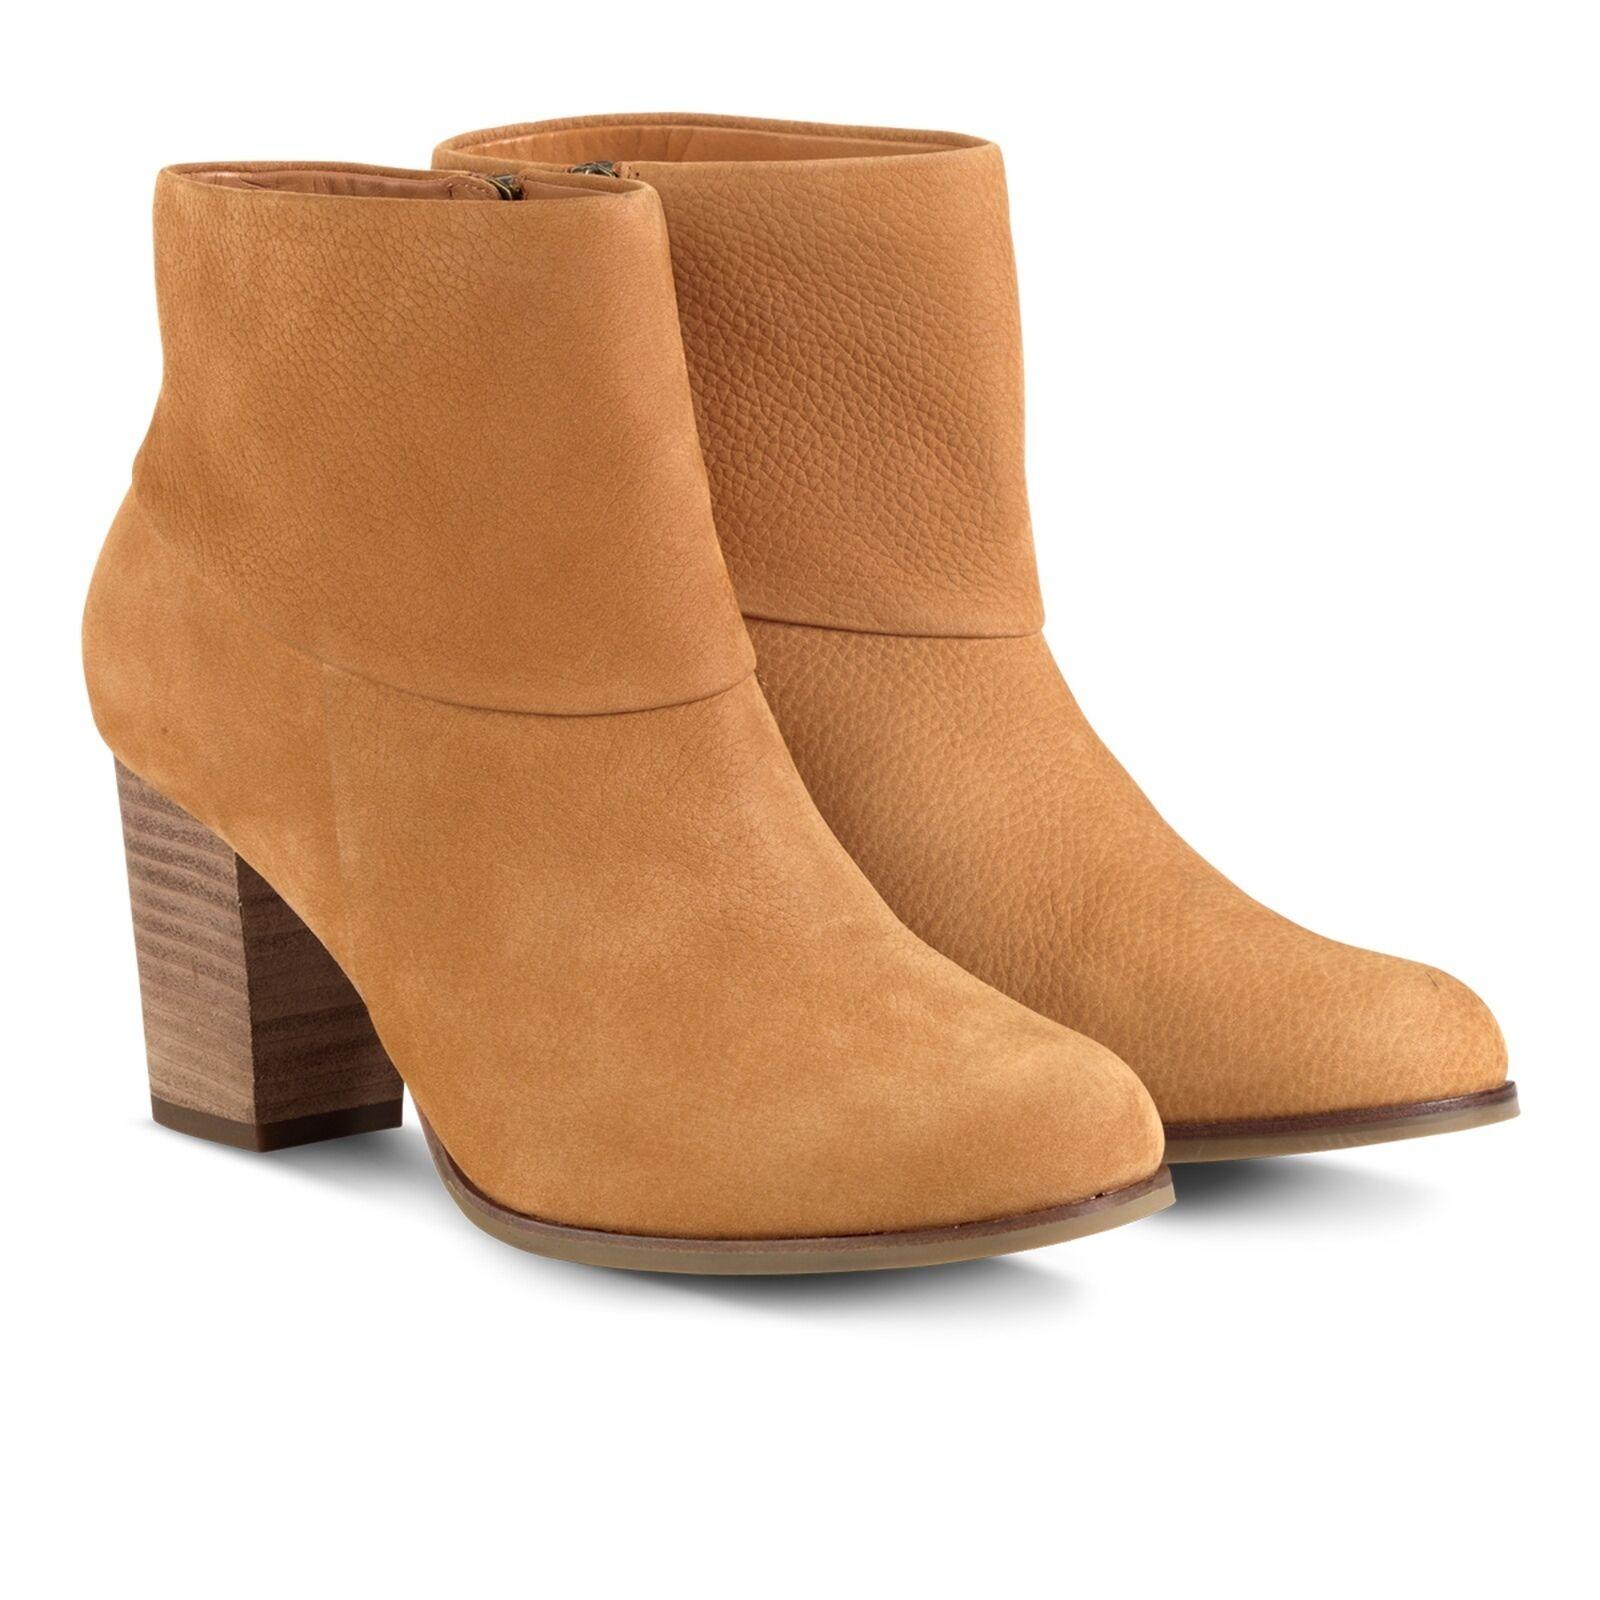 NIB Cole Haan Premium Pelle-lined Ankle Booties Short Stivali Size 8M